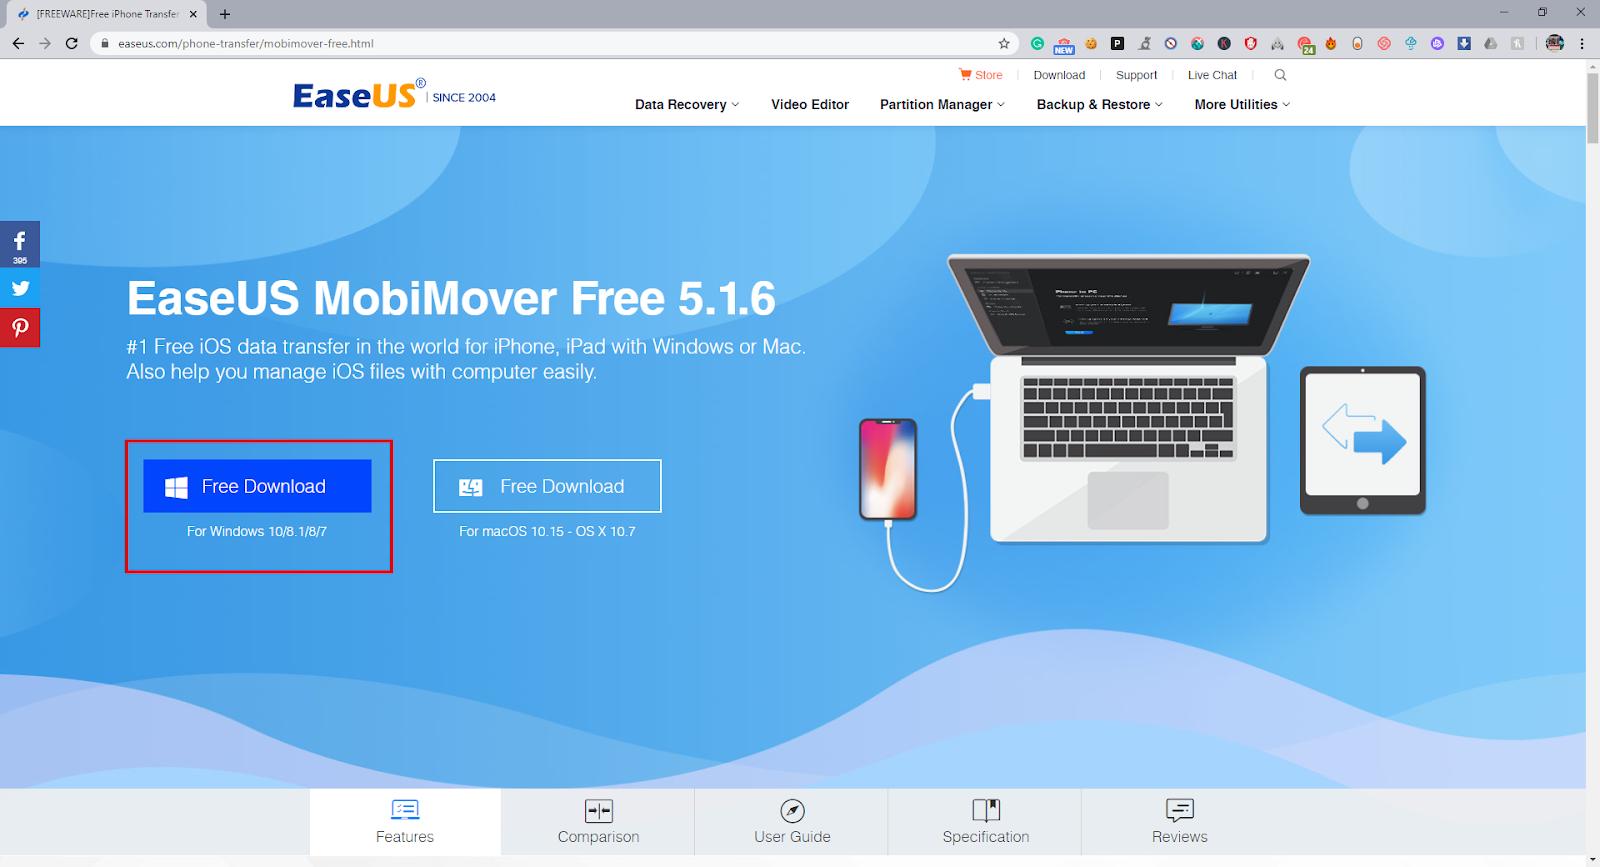 EaseUS free iBook download